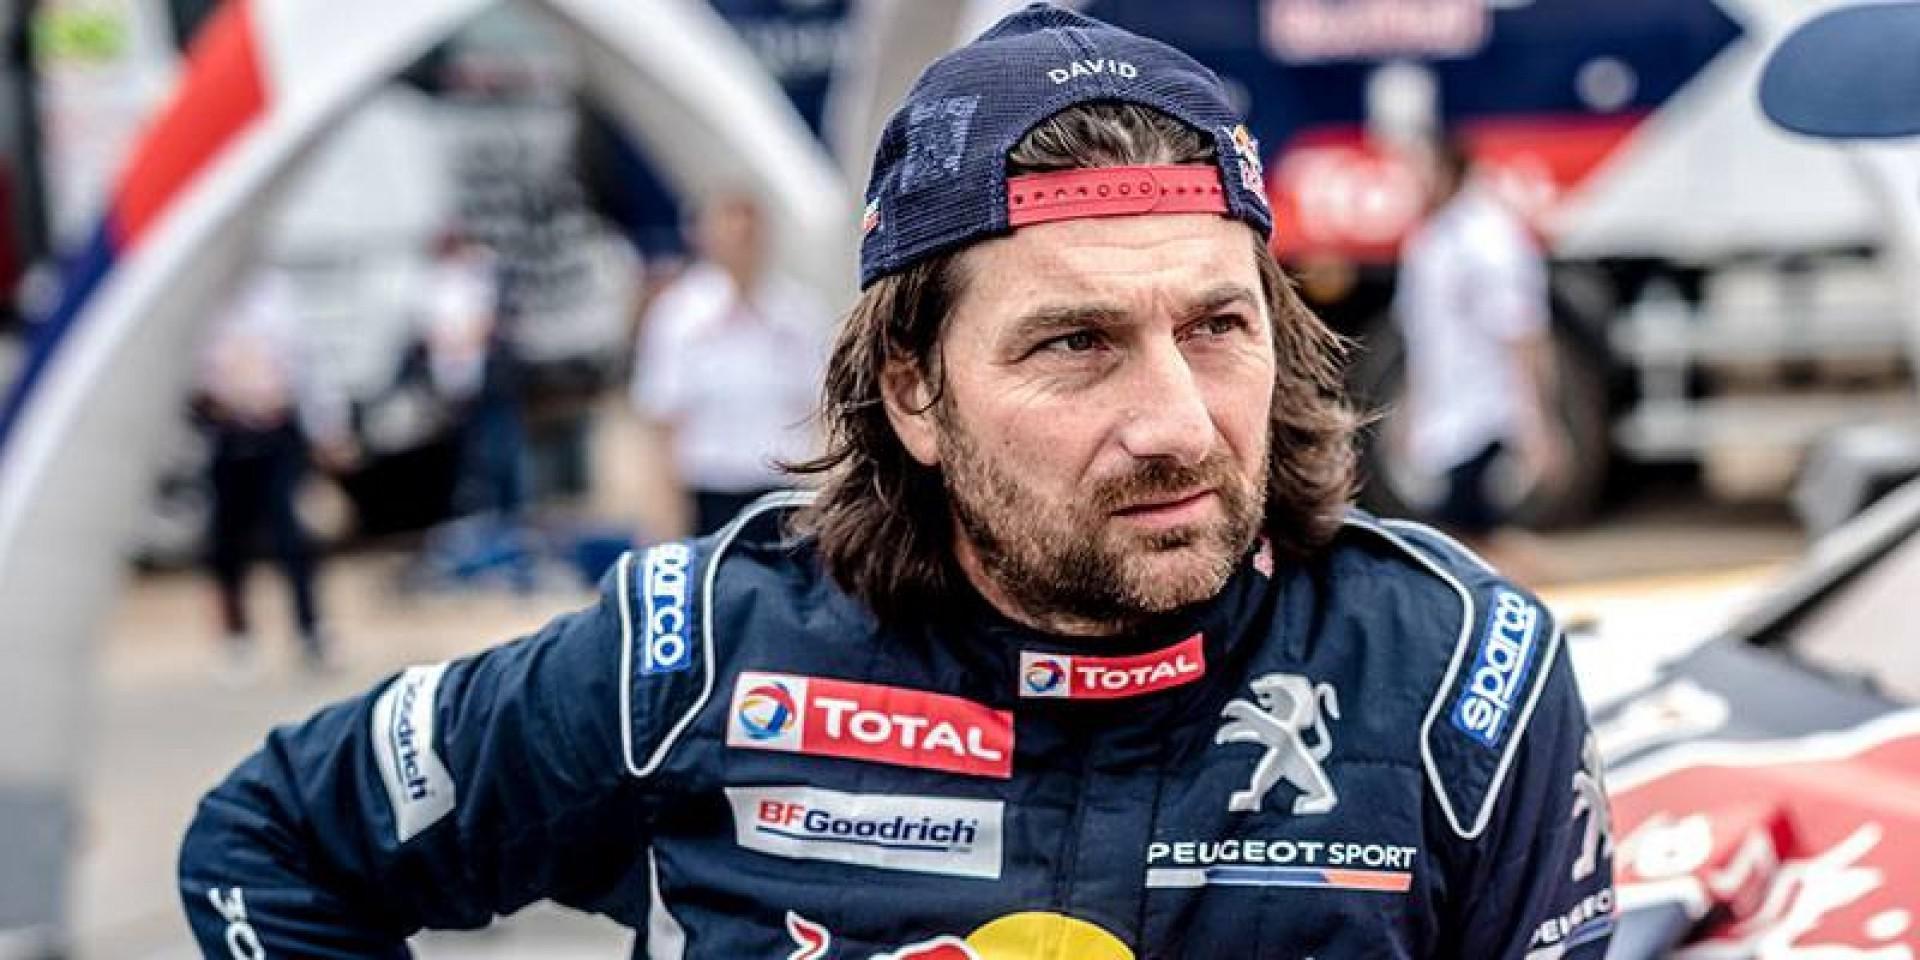 Rallye du Maroc : David castera en interview exclusive !